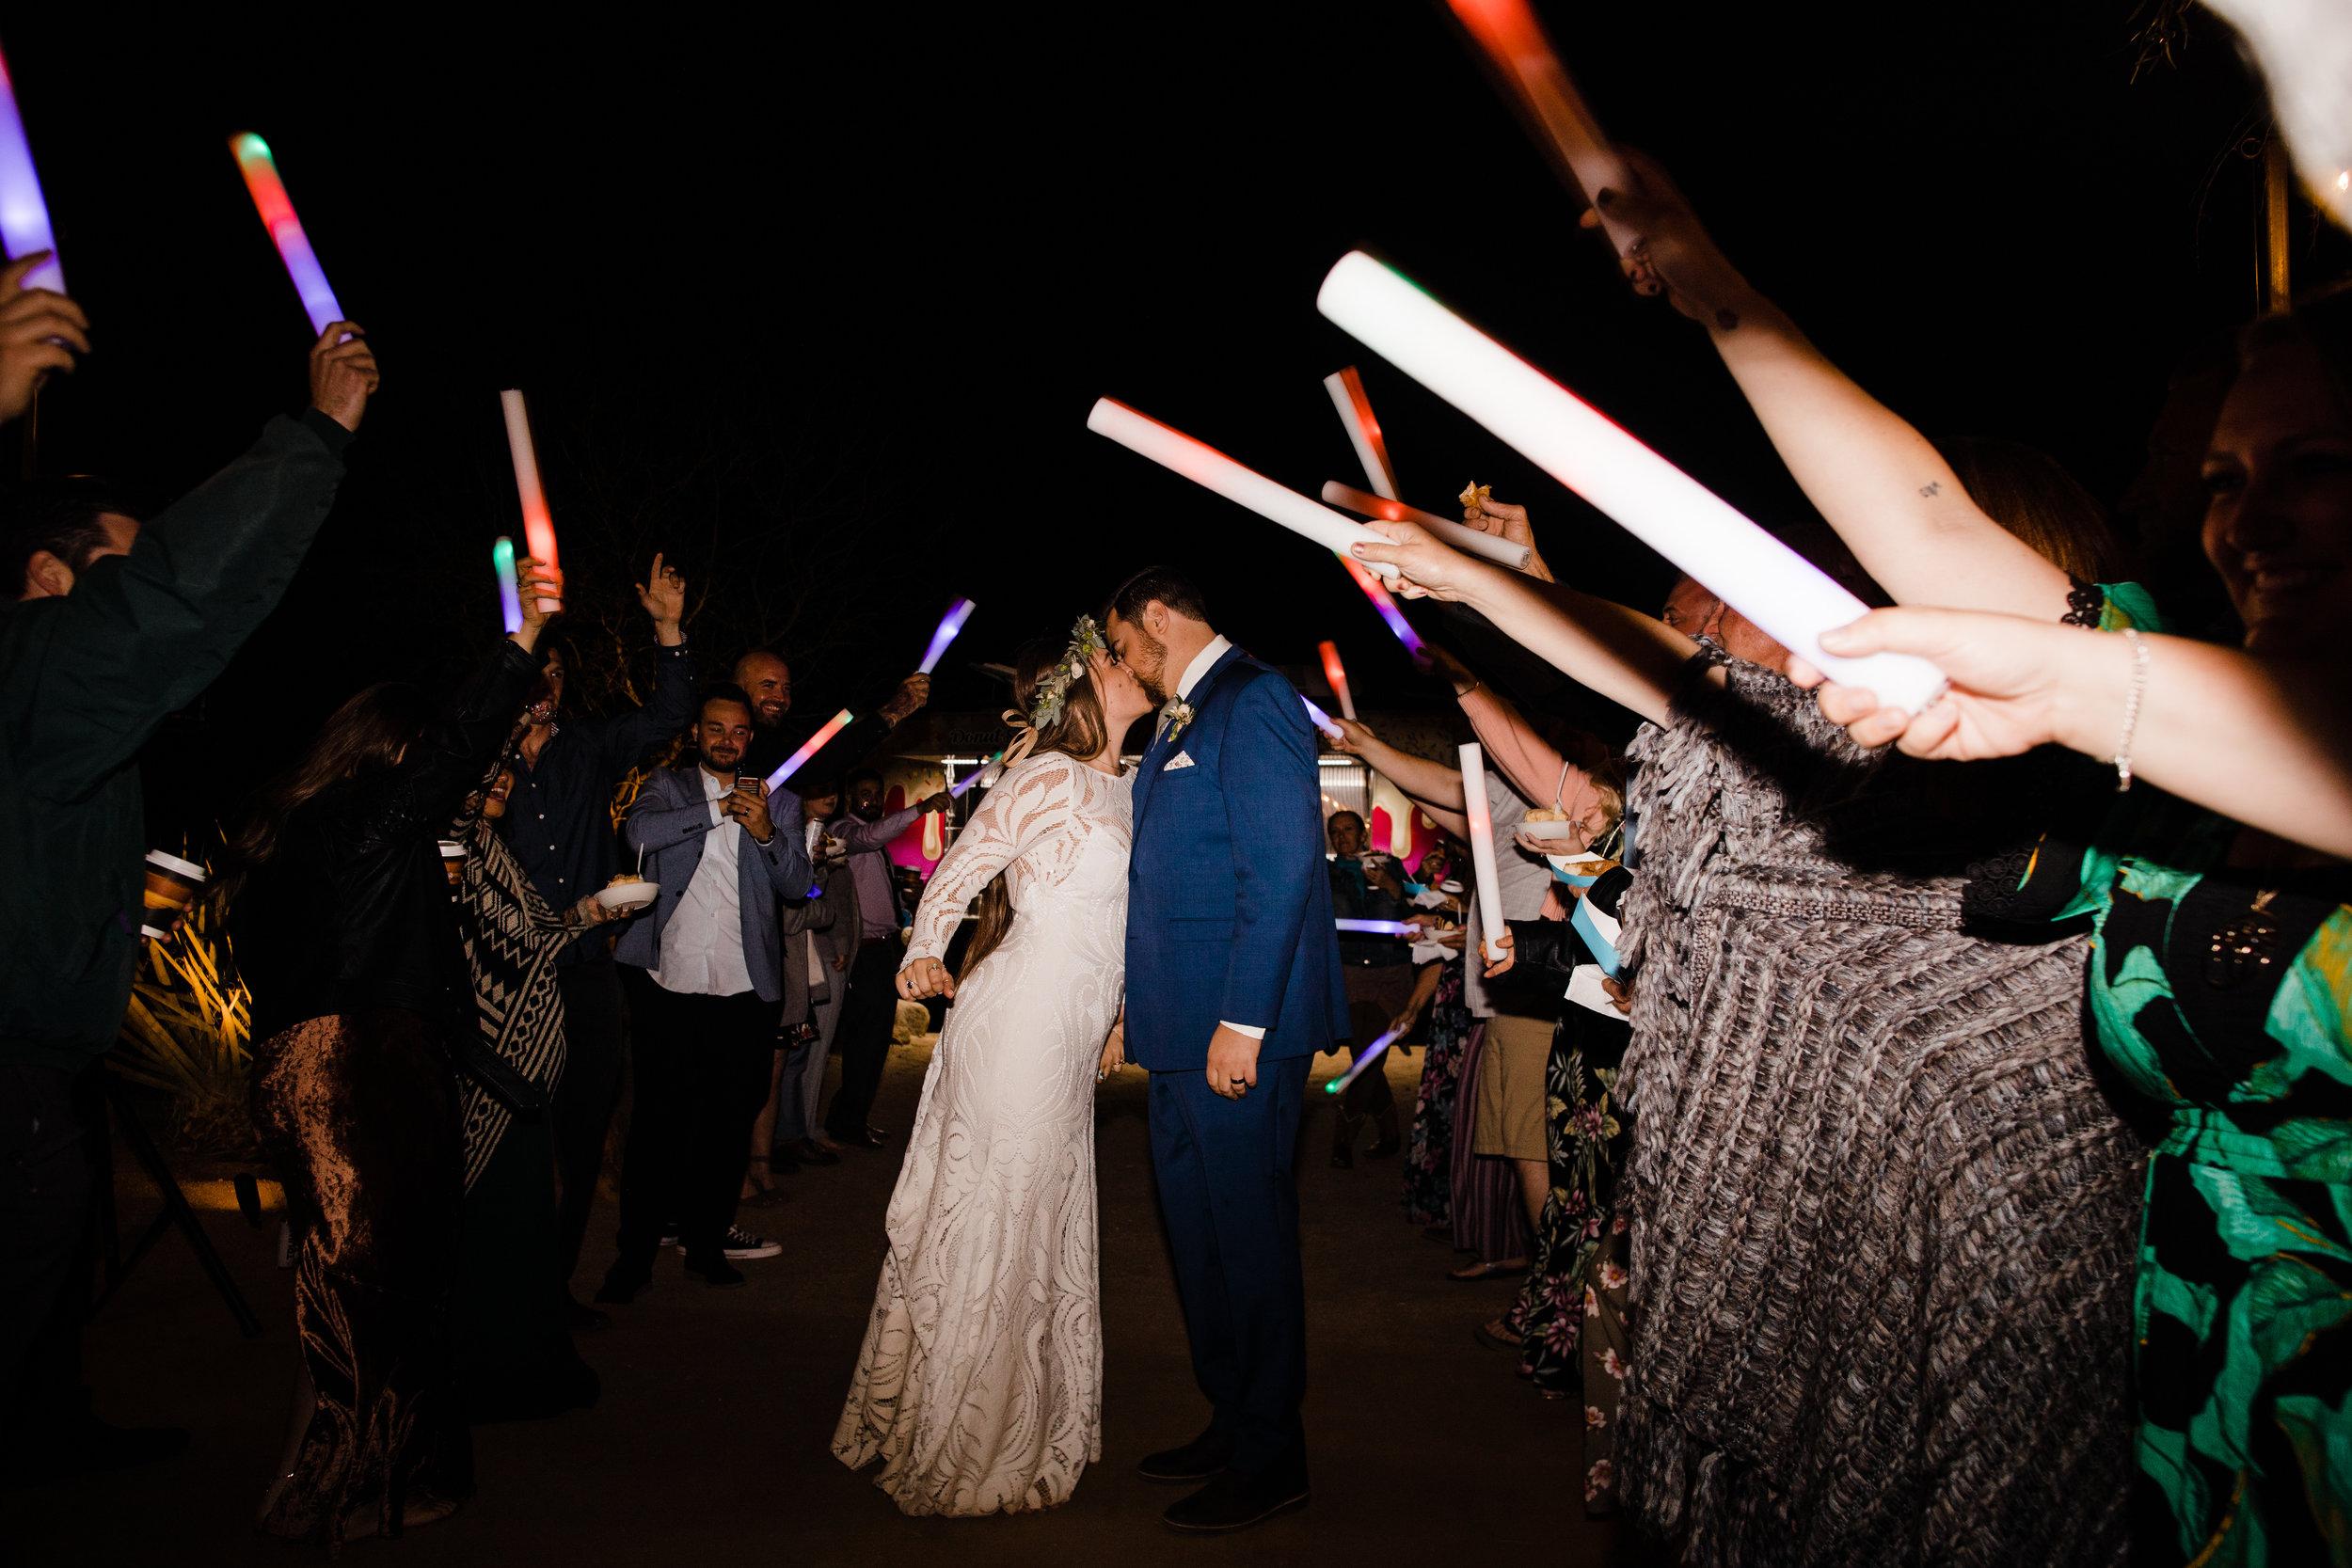 Glow Stick Wedding Reception Exit